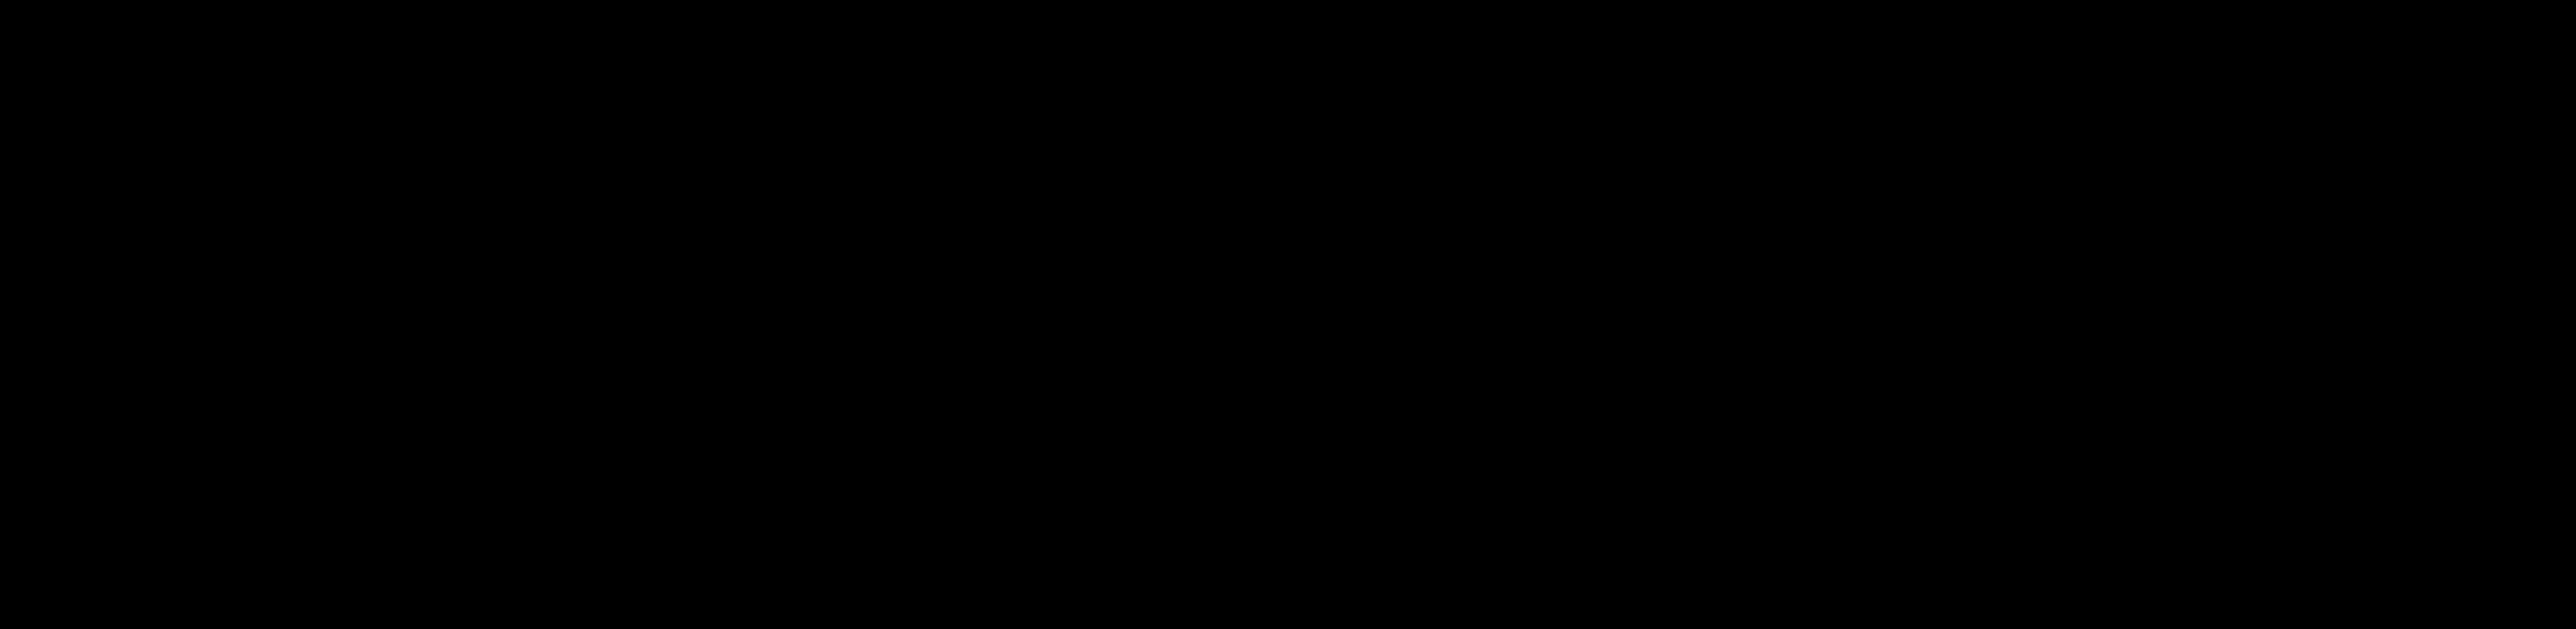 Enfuvirtide